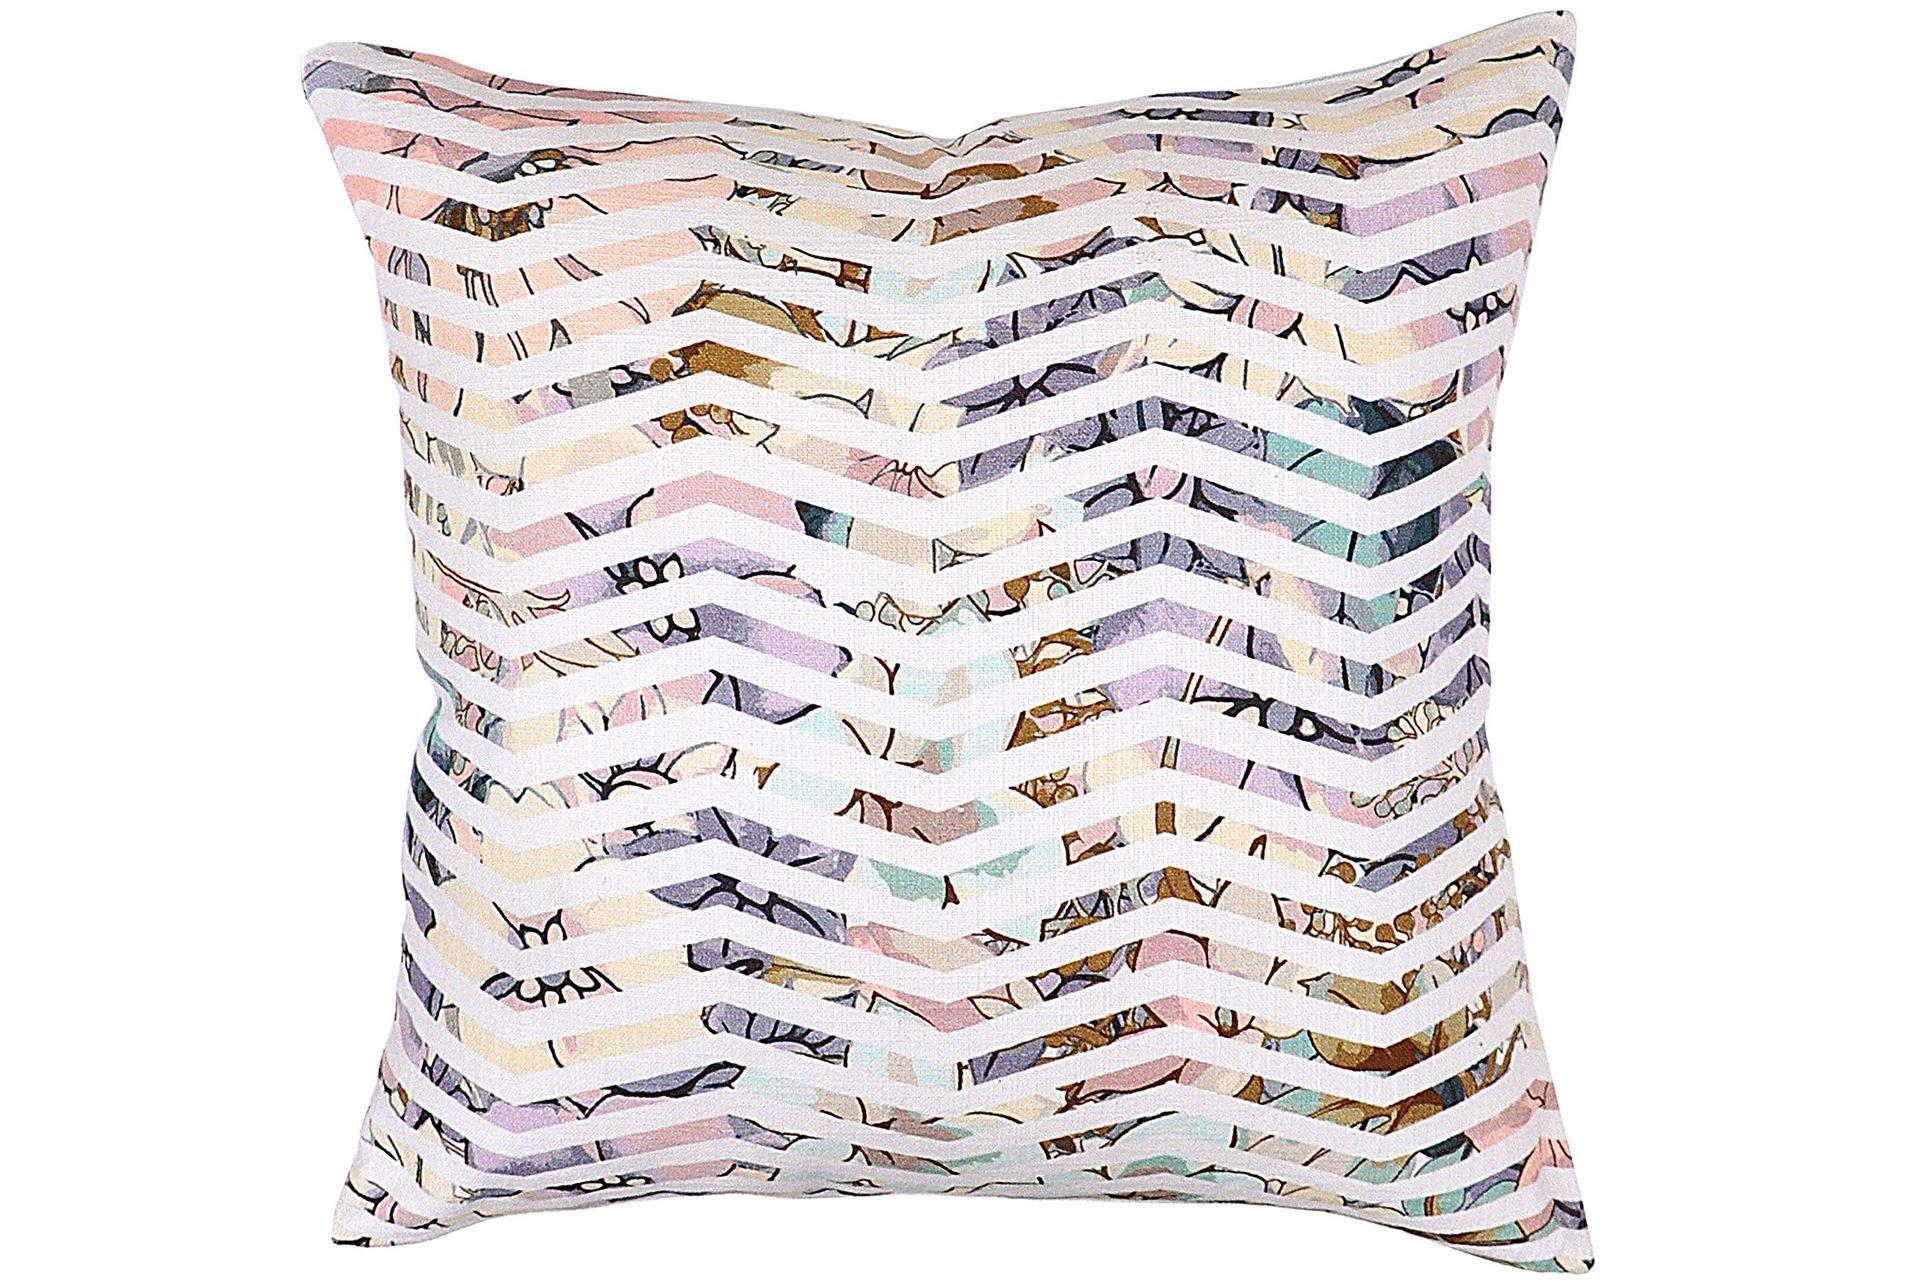 Decorative Pillows Living Spaces : Accent Pillow-Jude Floral Chevron 22X22 - Living Spaces